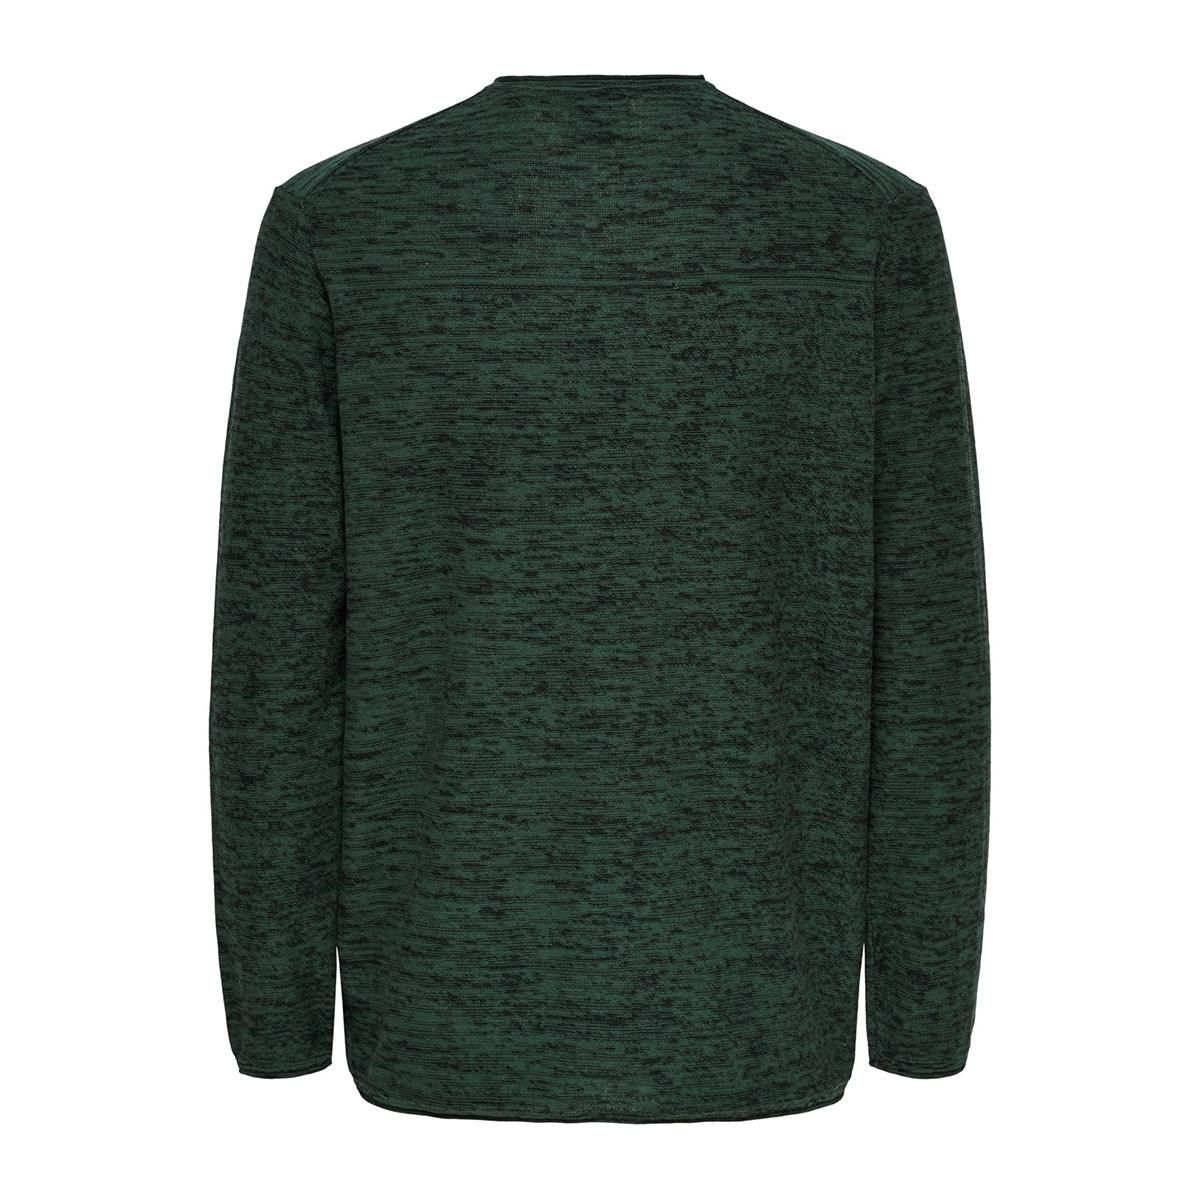 onsgarson 12 melange crew neck knit 22014420 only & sons trui trekking green